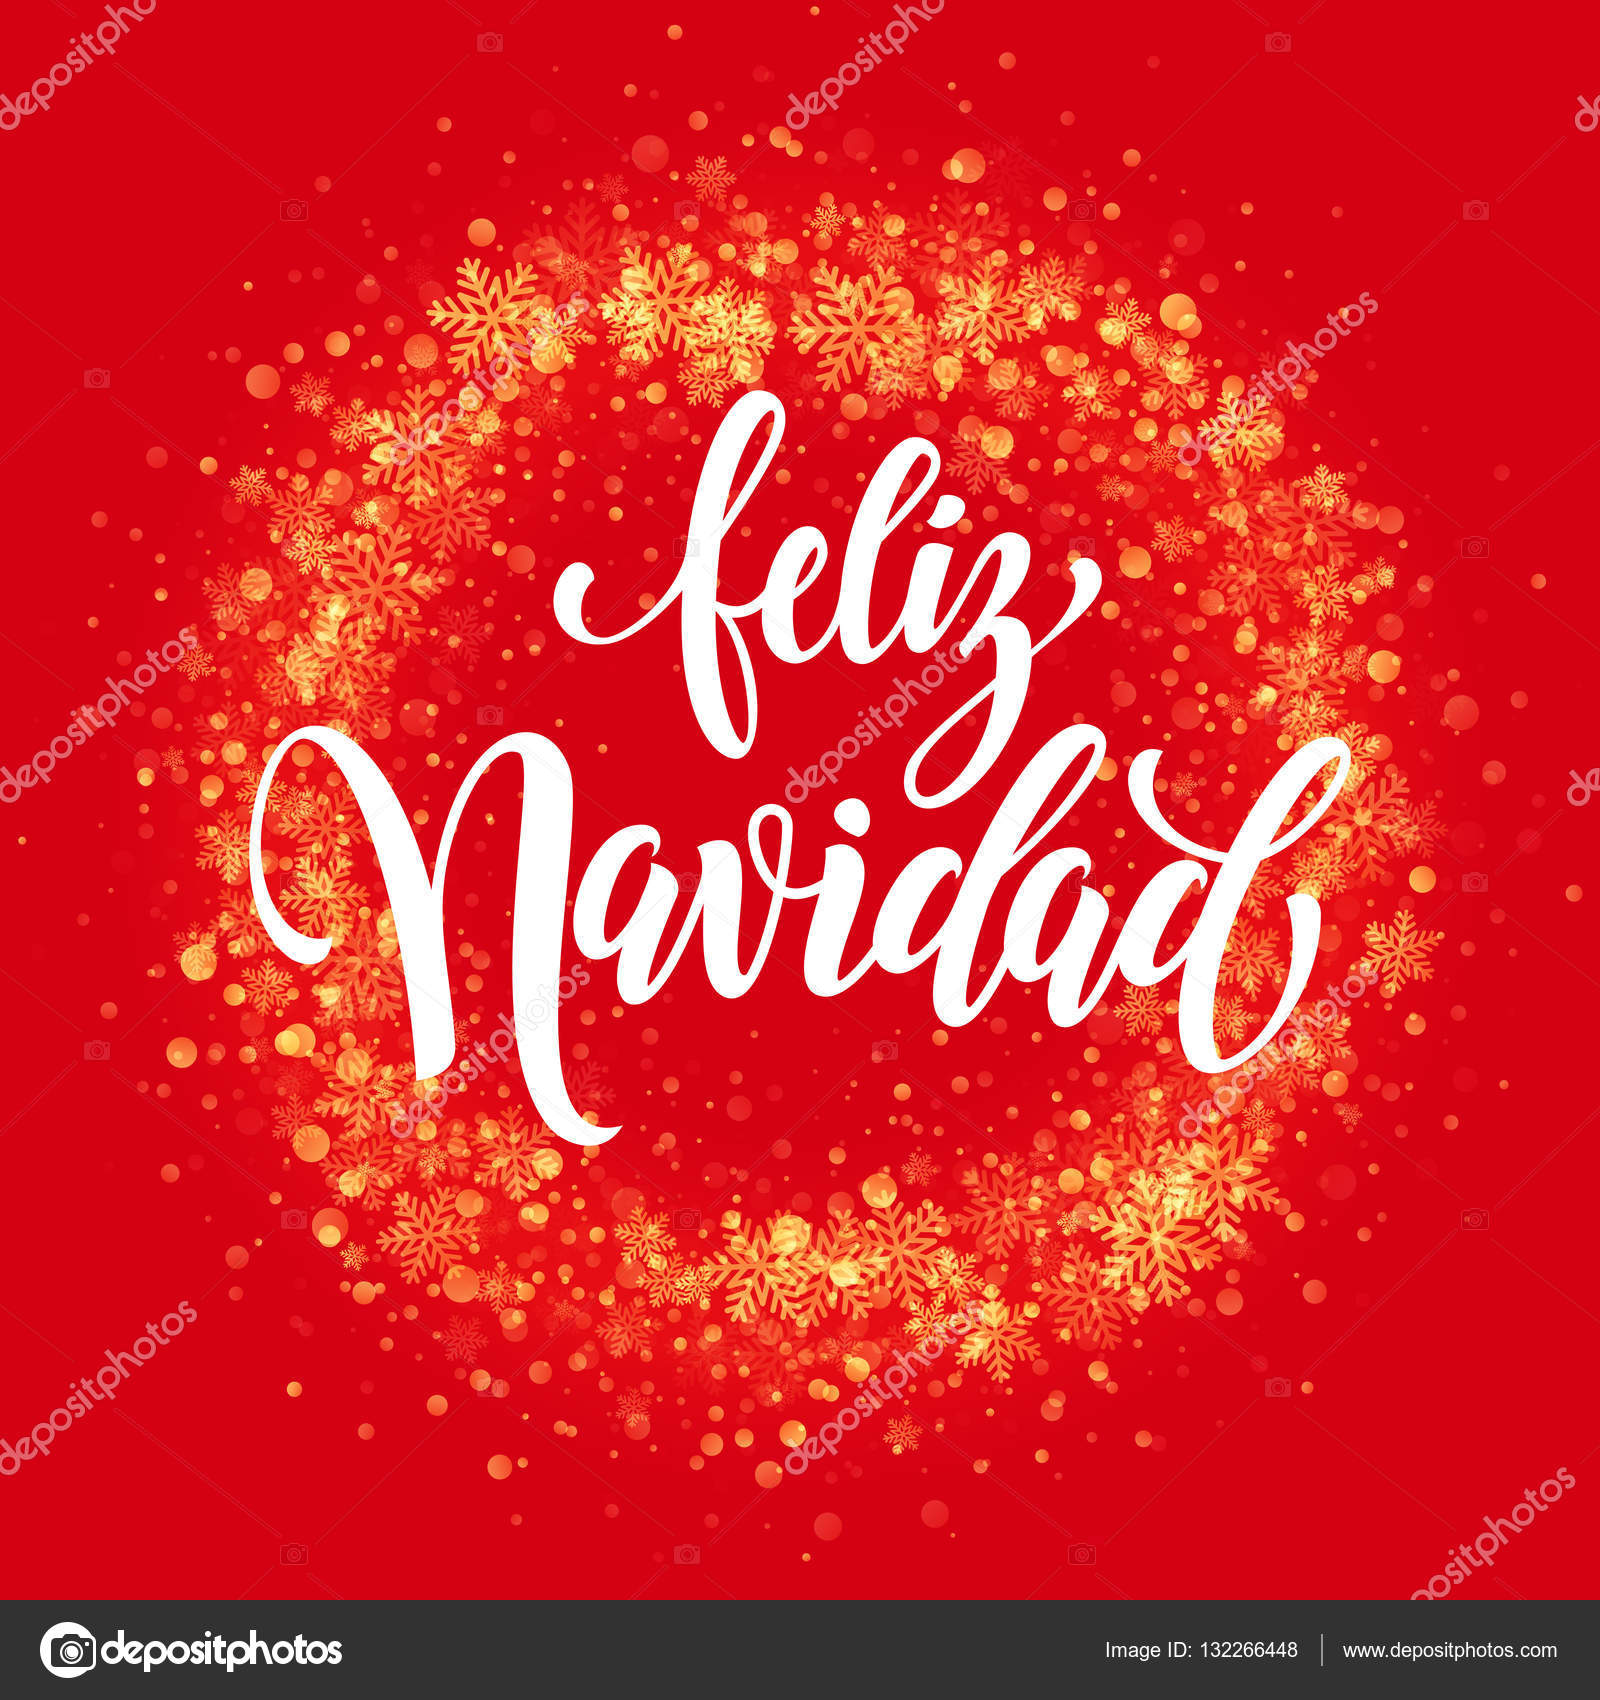 Spanish Merry Christmas Feliz Navidad Glitter Snowflake Wreath